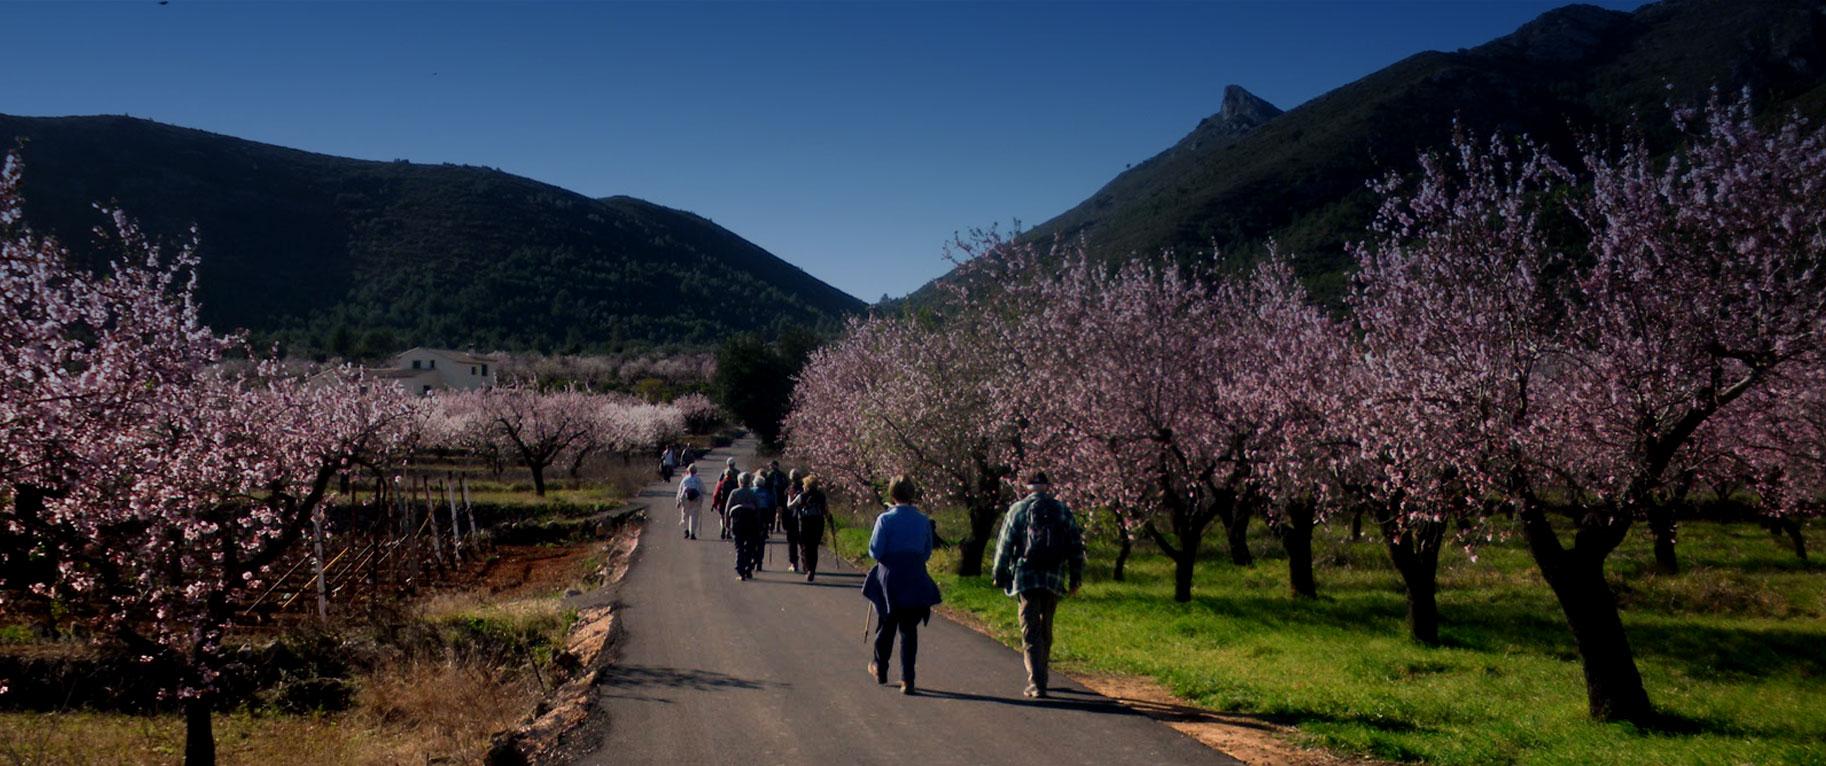 Ruta #AlcalalíEnFlor almendros en flor Feslalí - Alcalalí turismo